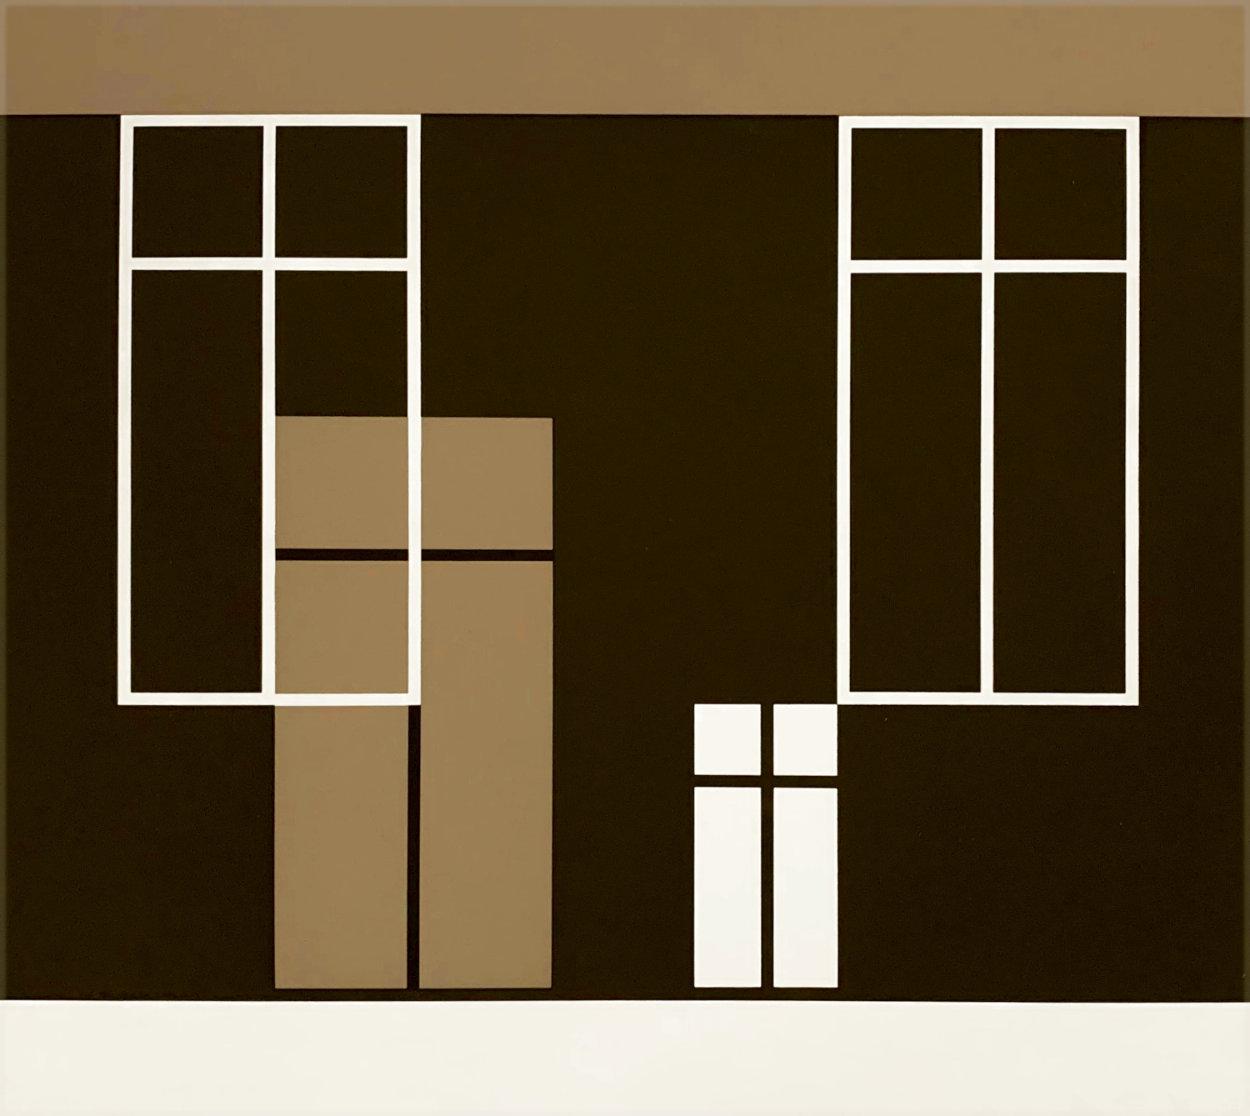 Formulation: Articulation, Portfolio 1 Folder 21 1972 Limited Edition Print by Josef Albers